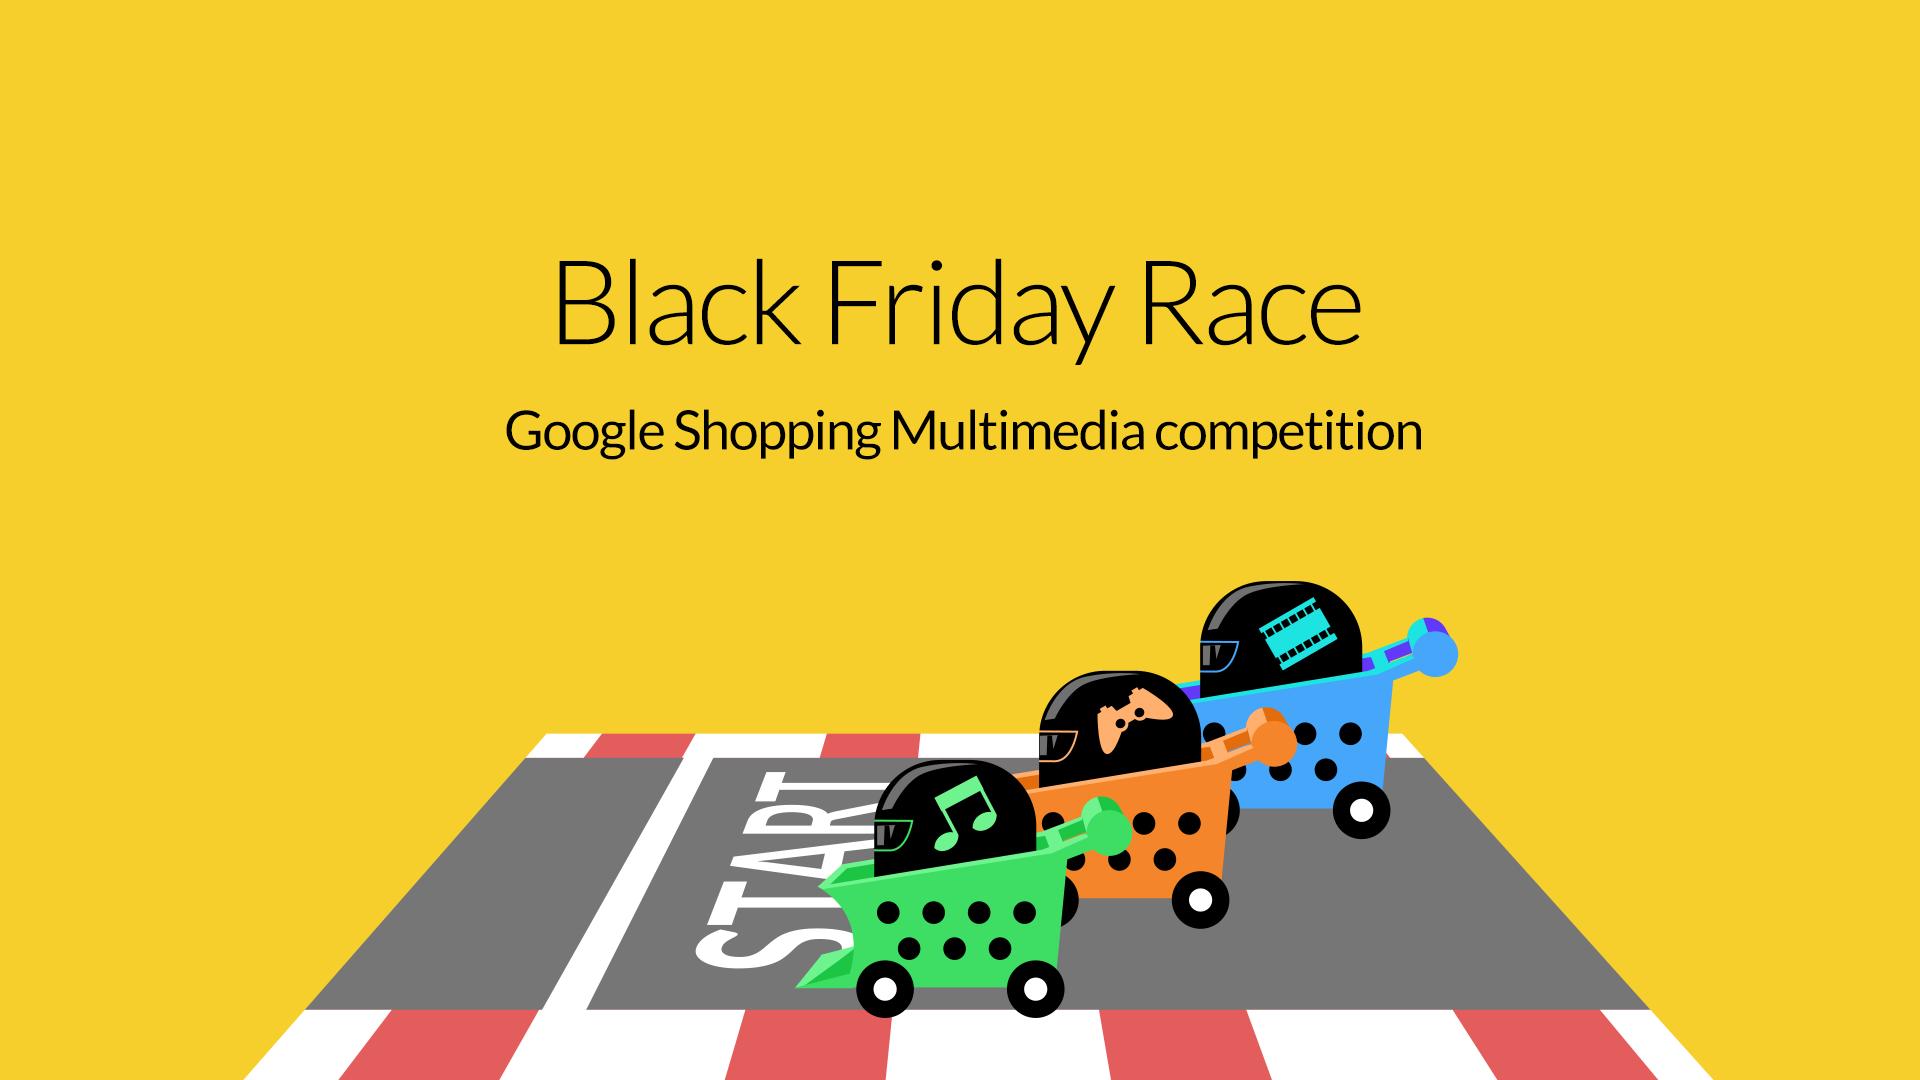 Google Shopping Black Friday Race 2015: Multimedia…